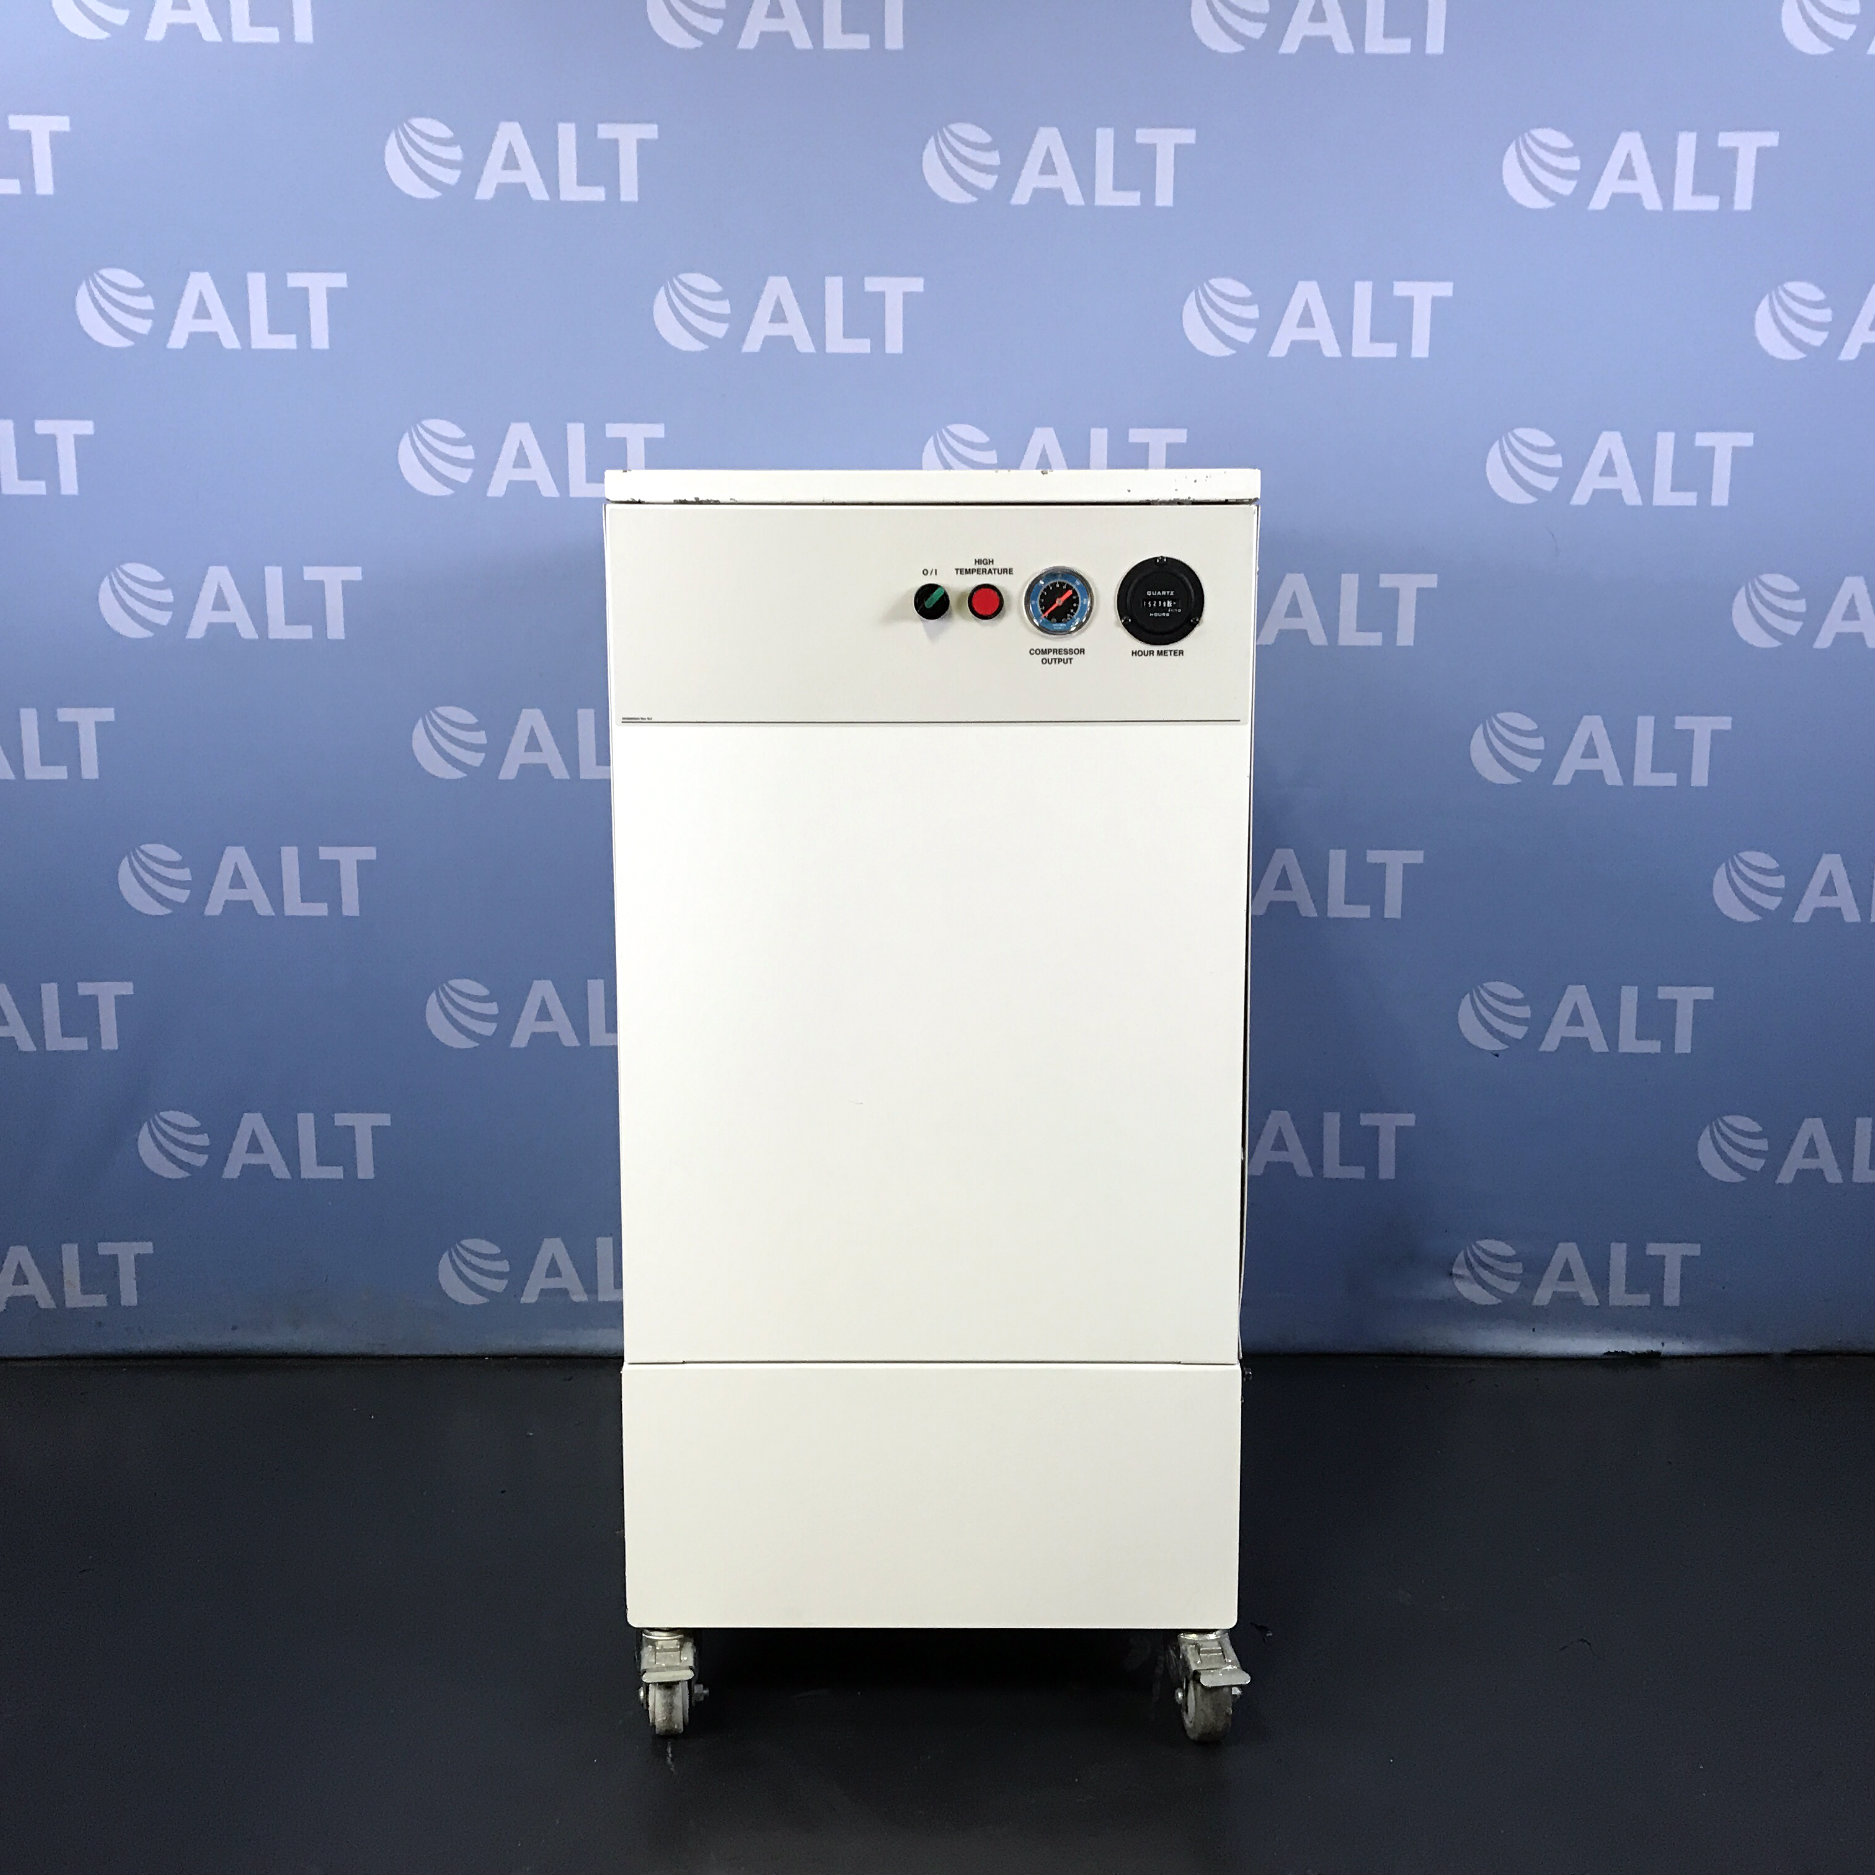 Powerex Model SF130872PHA 13 Gallon Air Compressor Image